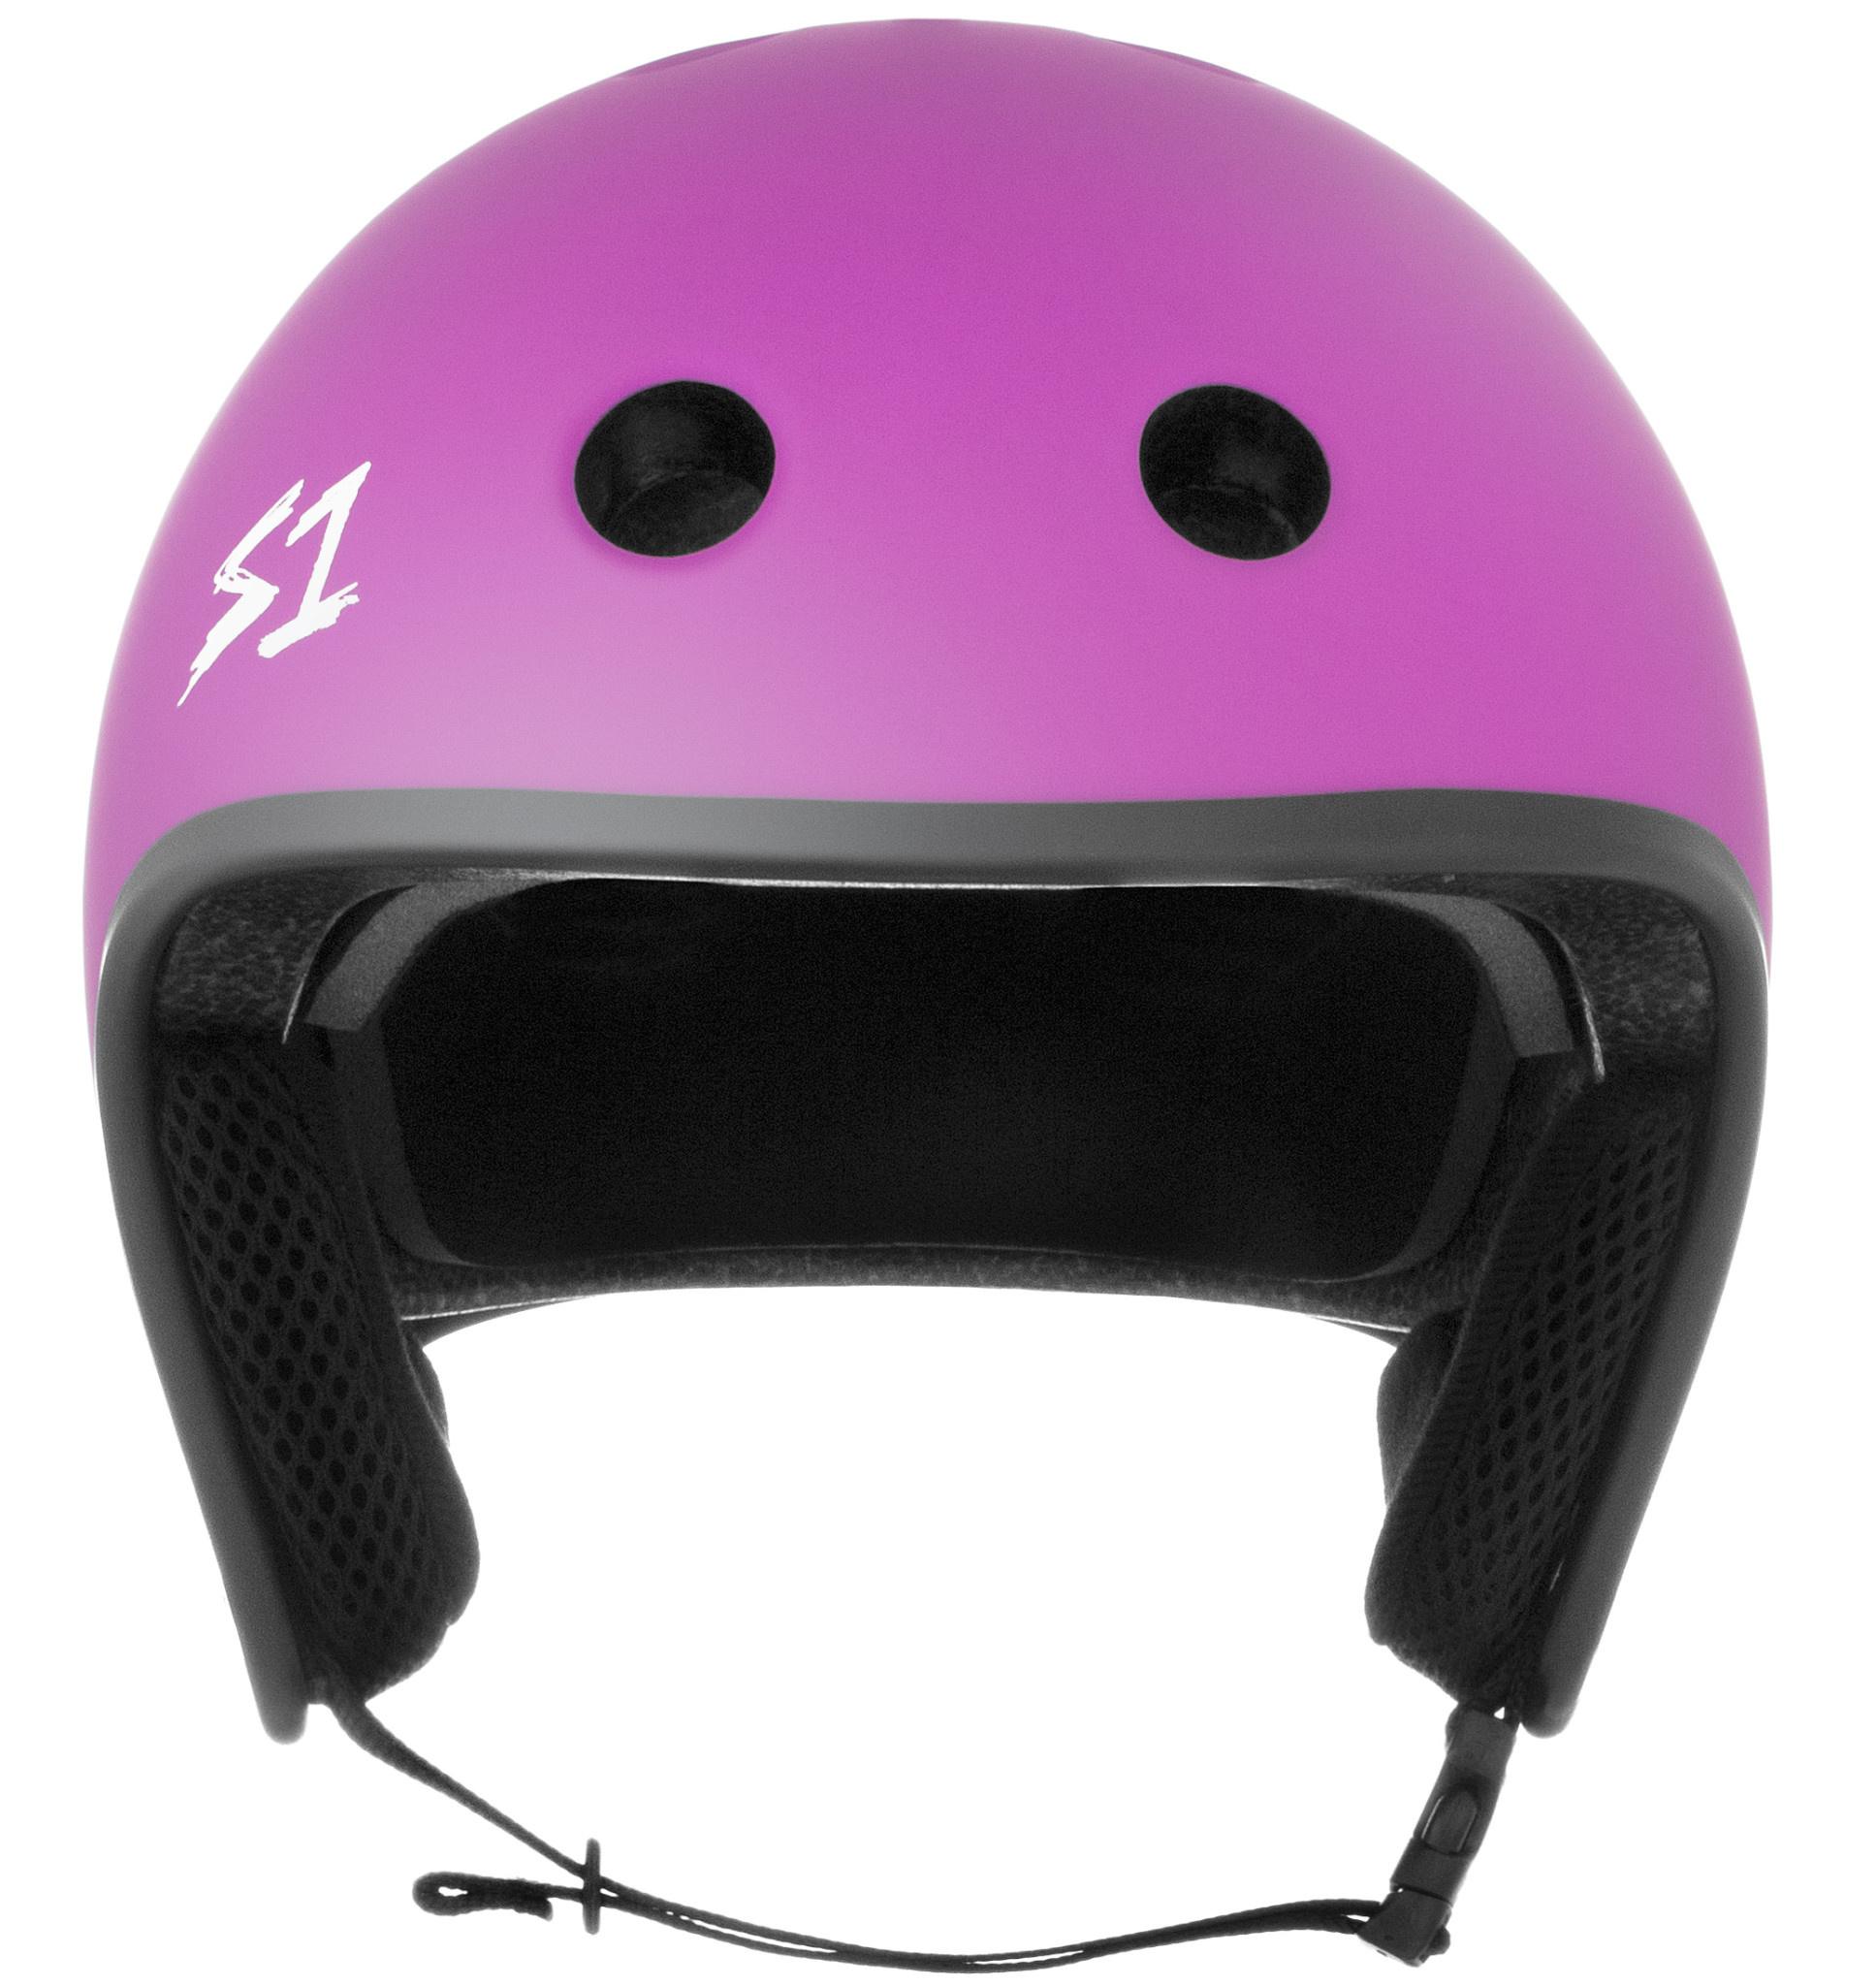 S-1 Retro Lifer Helmet - Bright Purple Matte